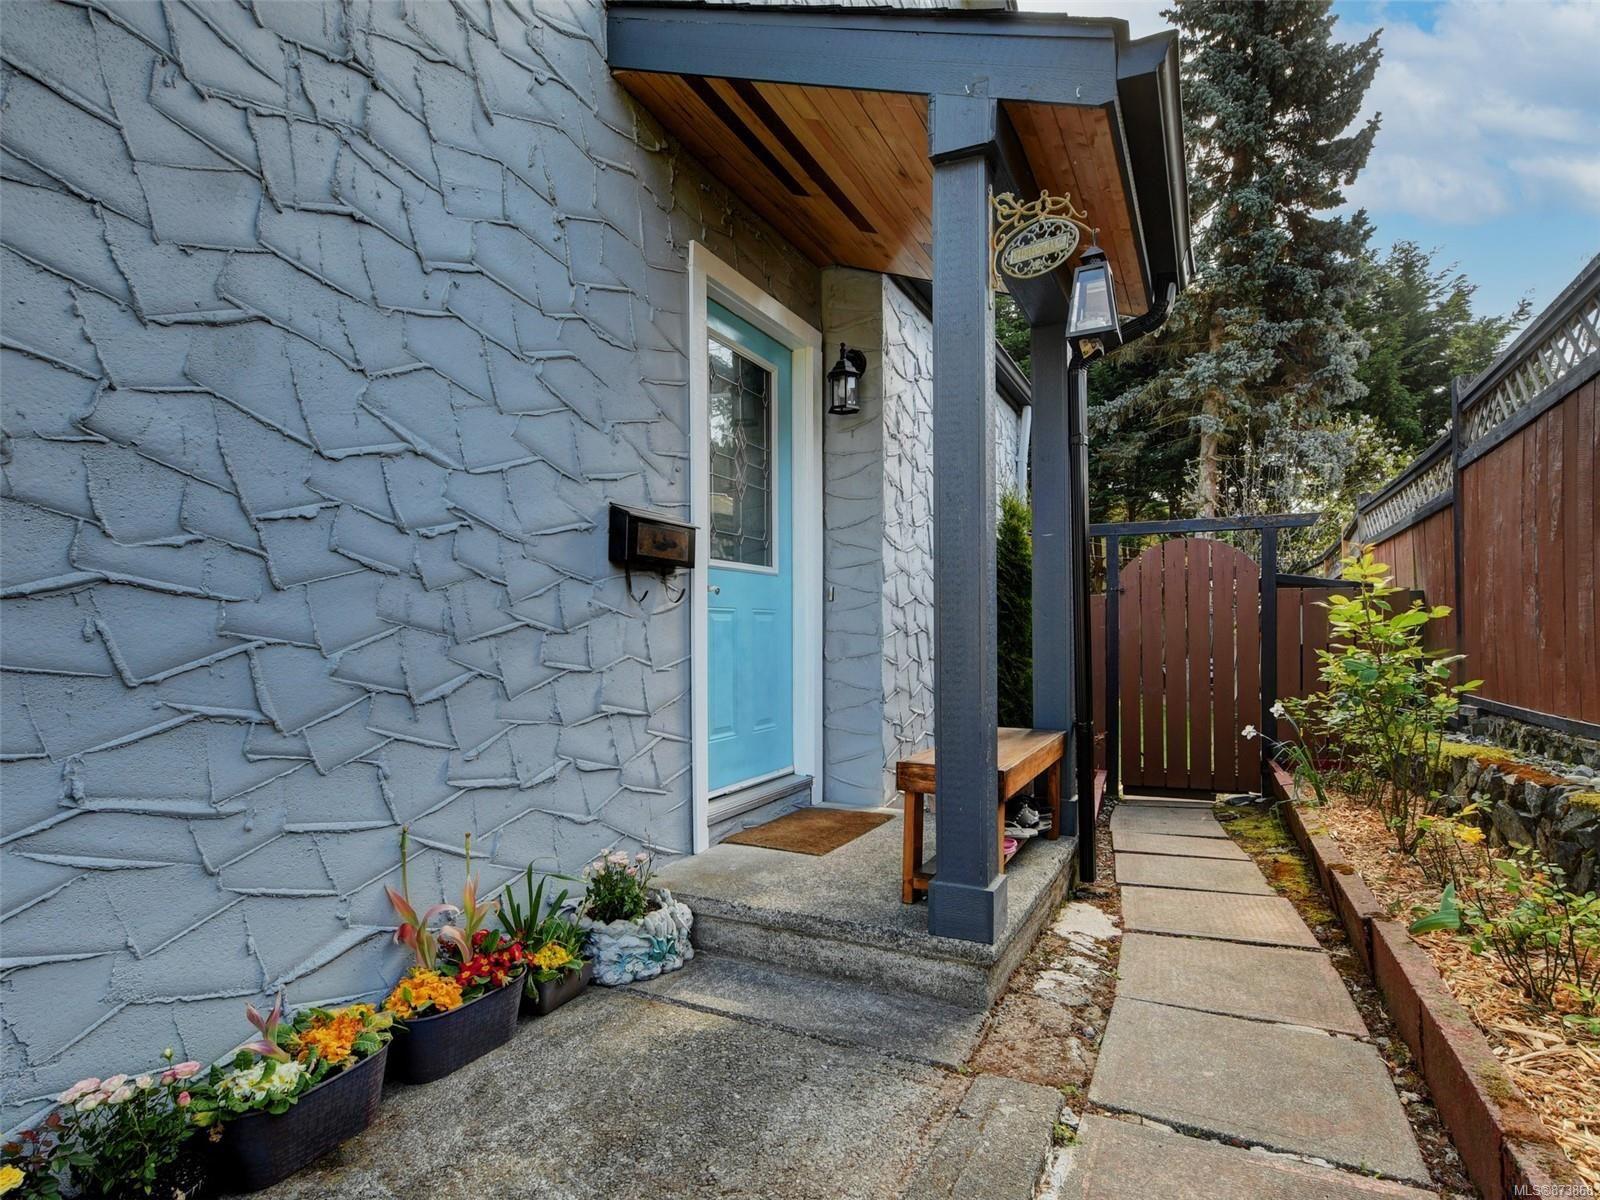 Main Photo: 3027 Metchosin Rd in : Co Hatley Park Half Duplex for sale (Colwood)  : MLS®# 873868